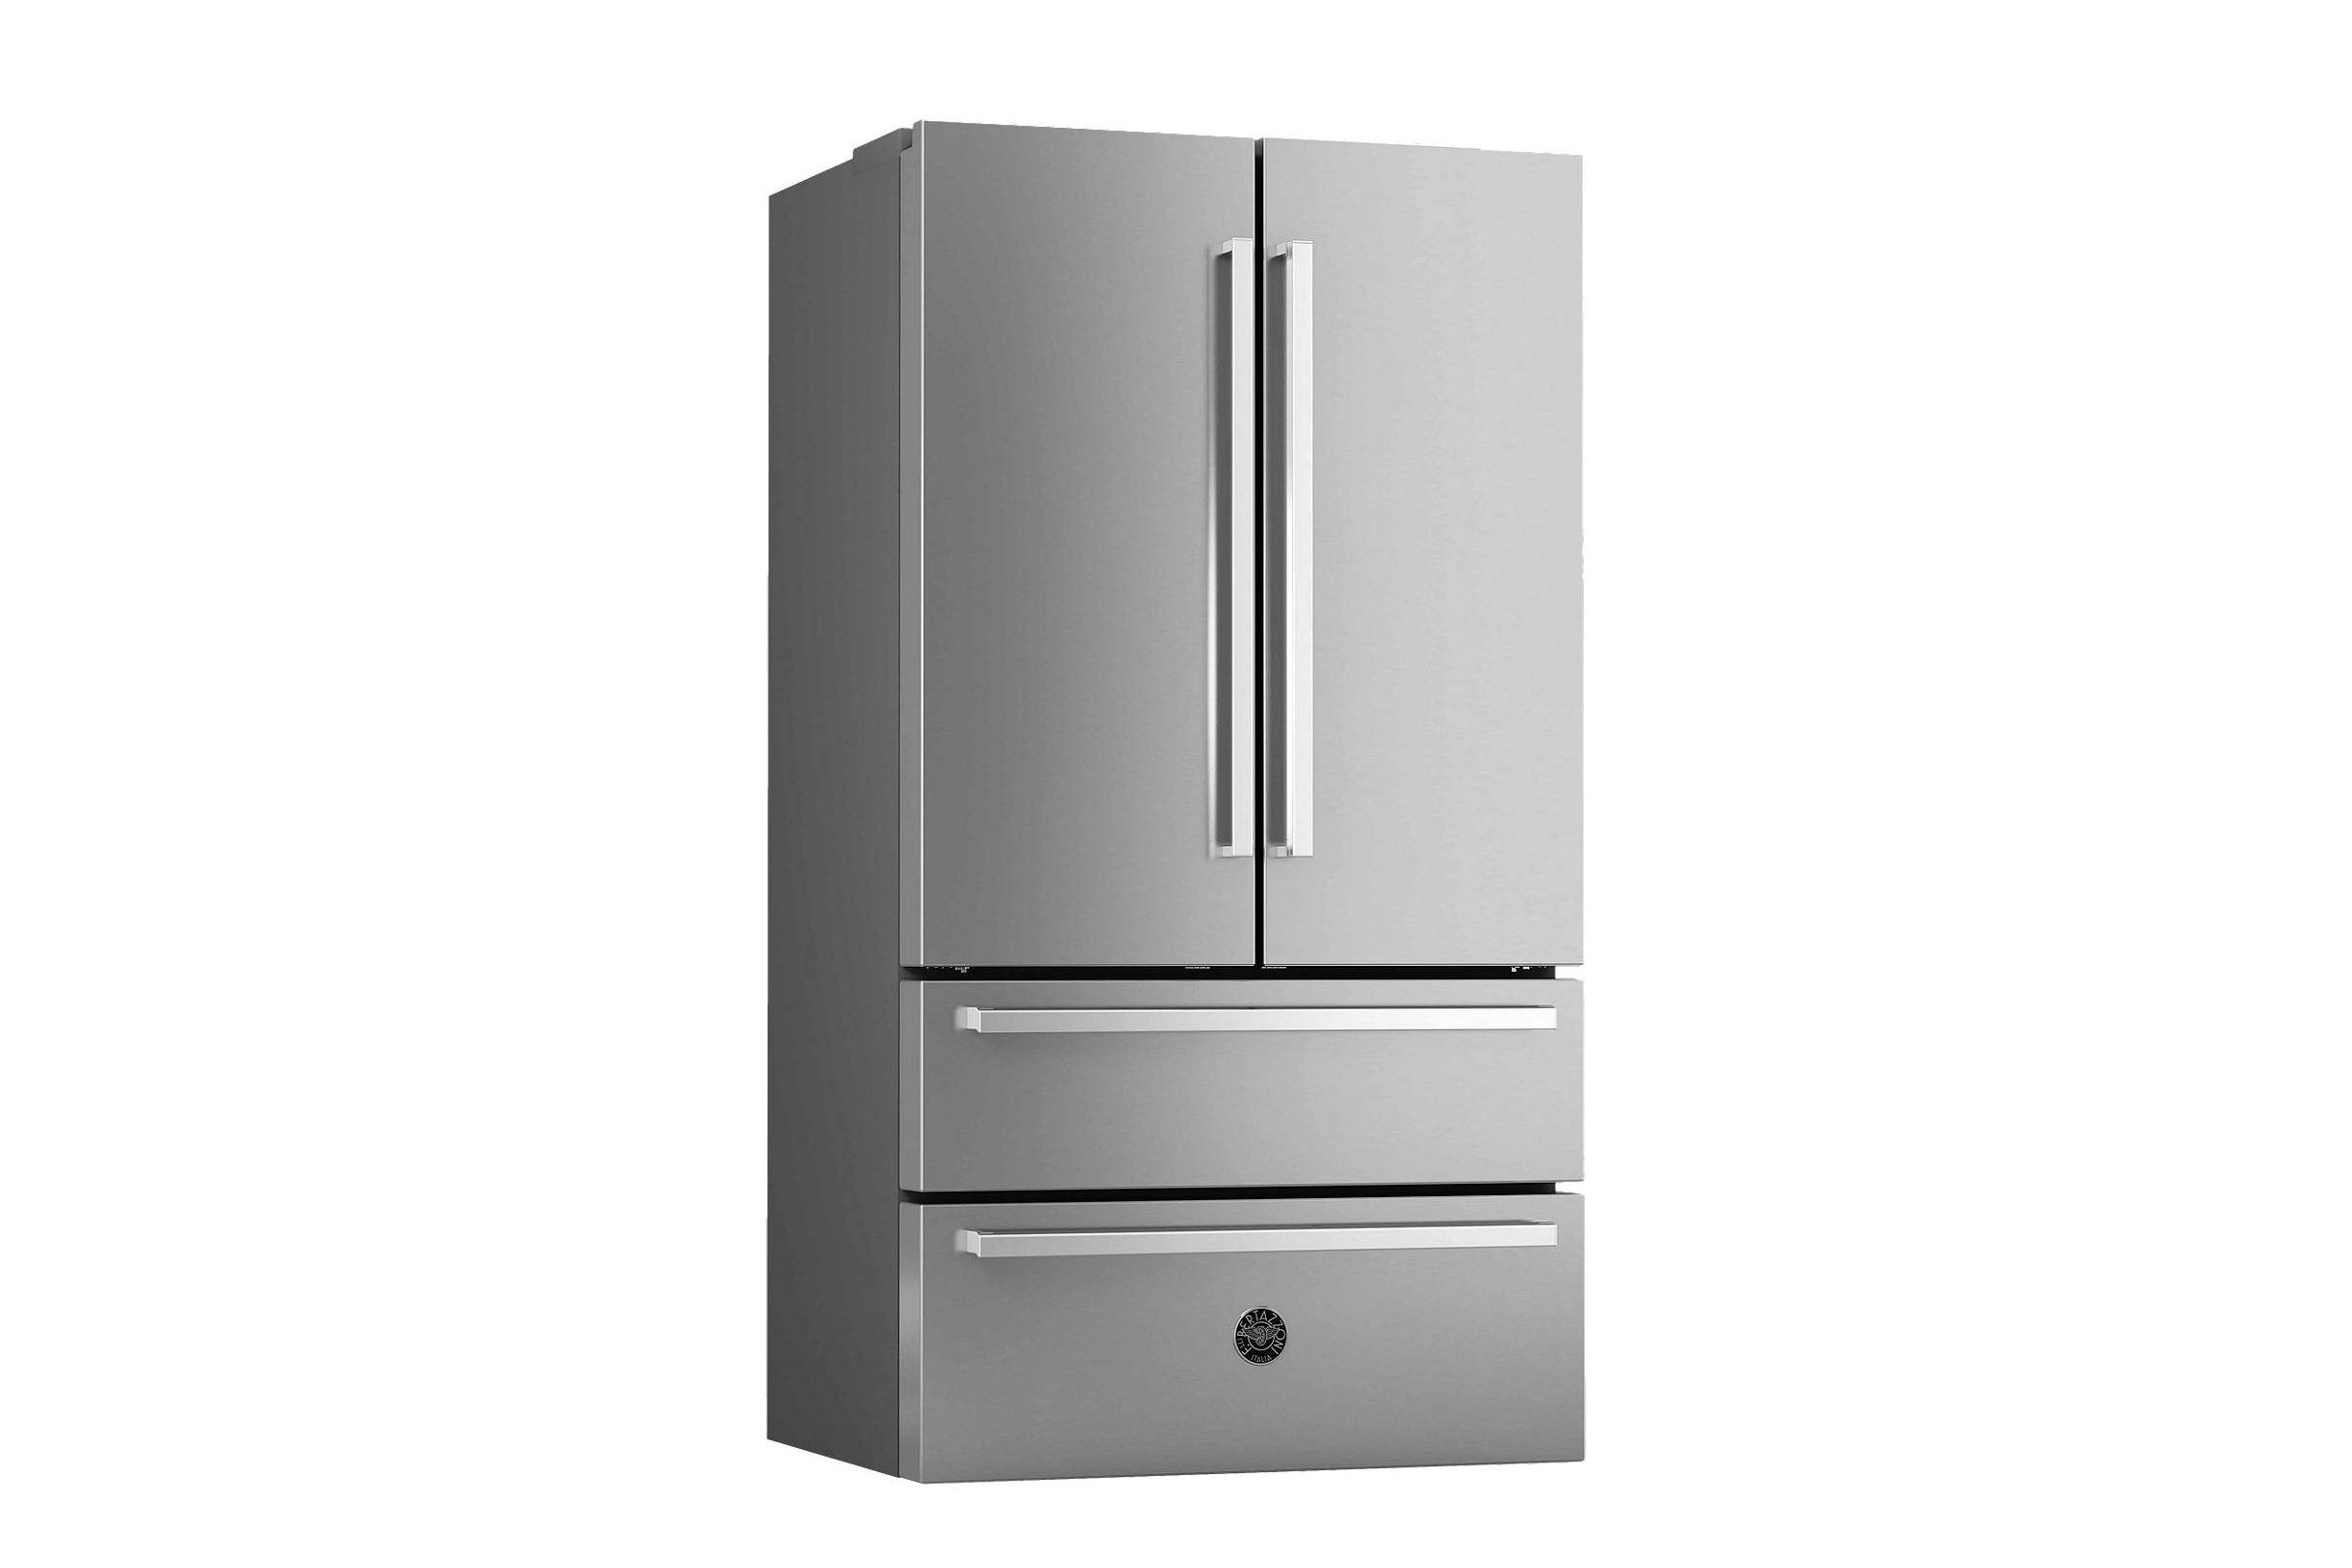 Best fridge freezer 2019: Make your food last longer